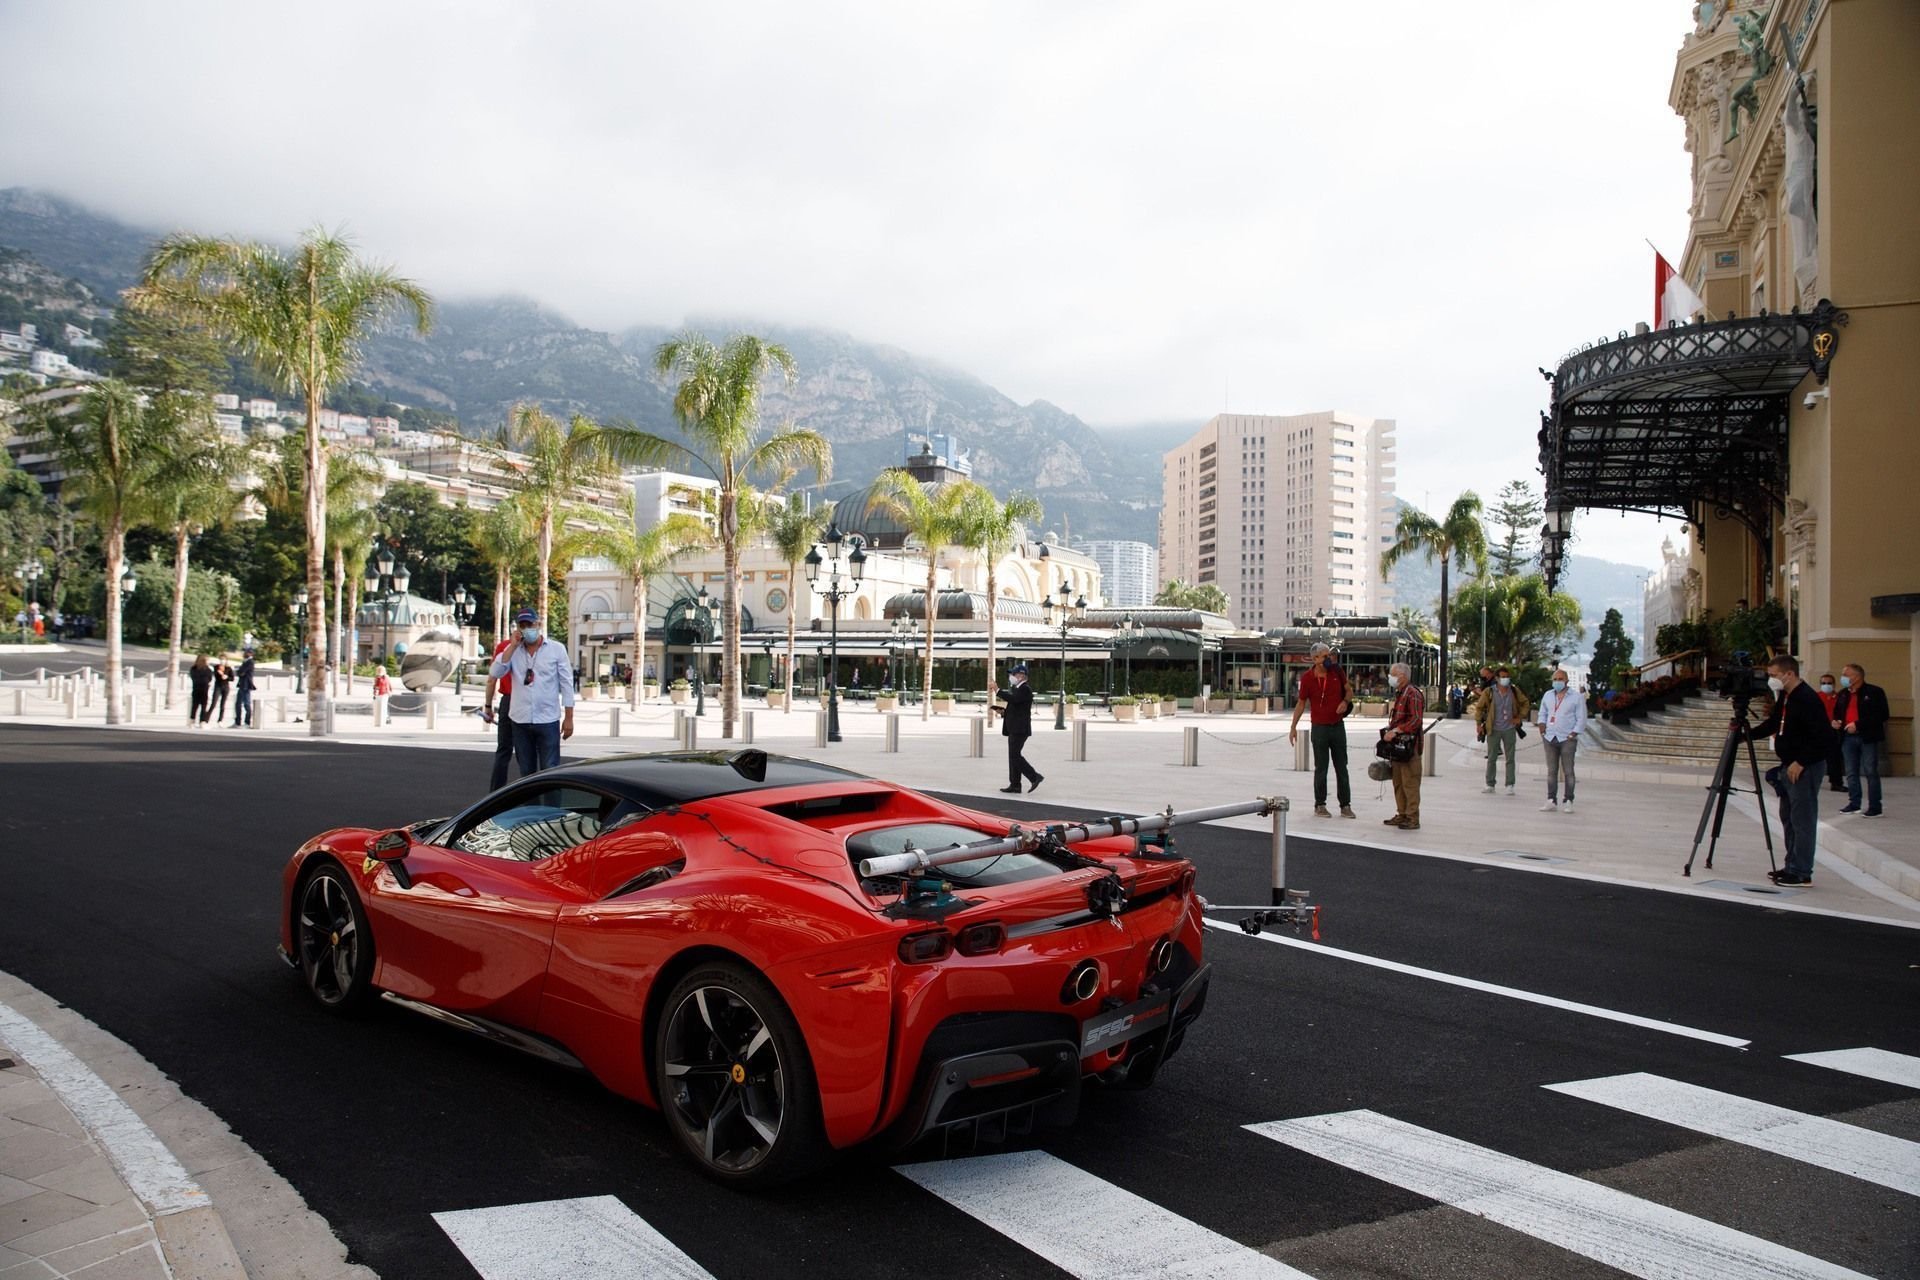 Ferrari_SF90_Stradale_Claude_Charles_Leclerc_Monaco_2020_0002